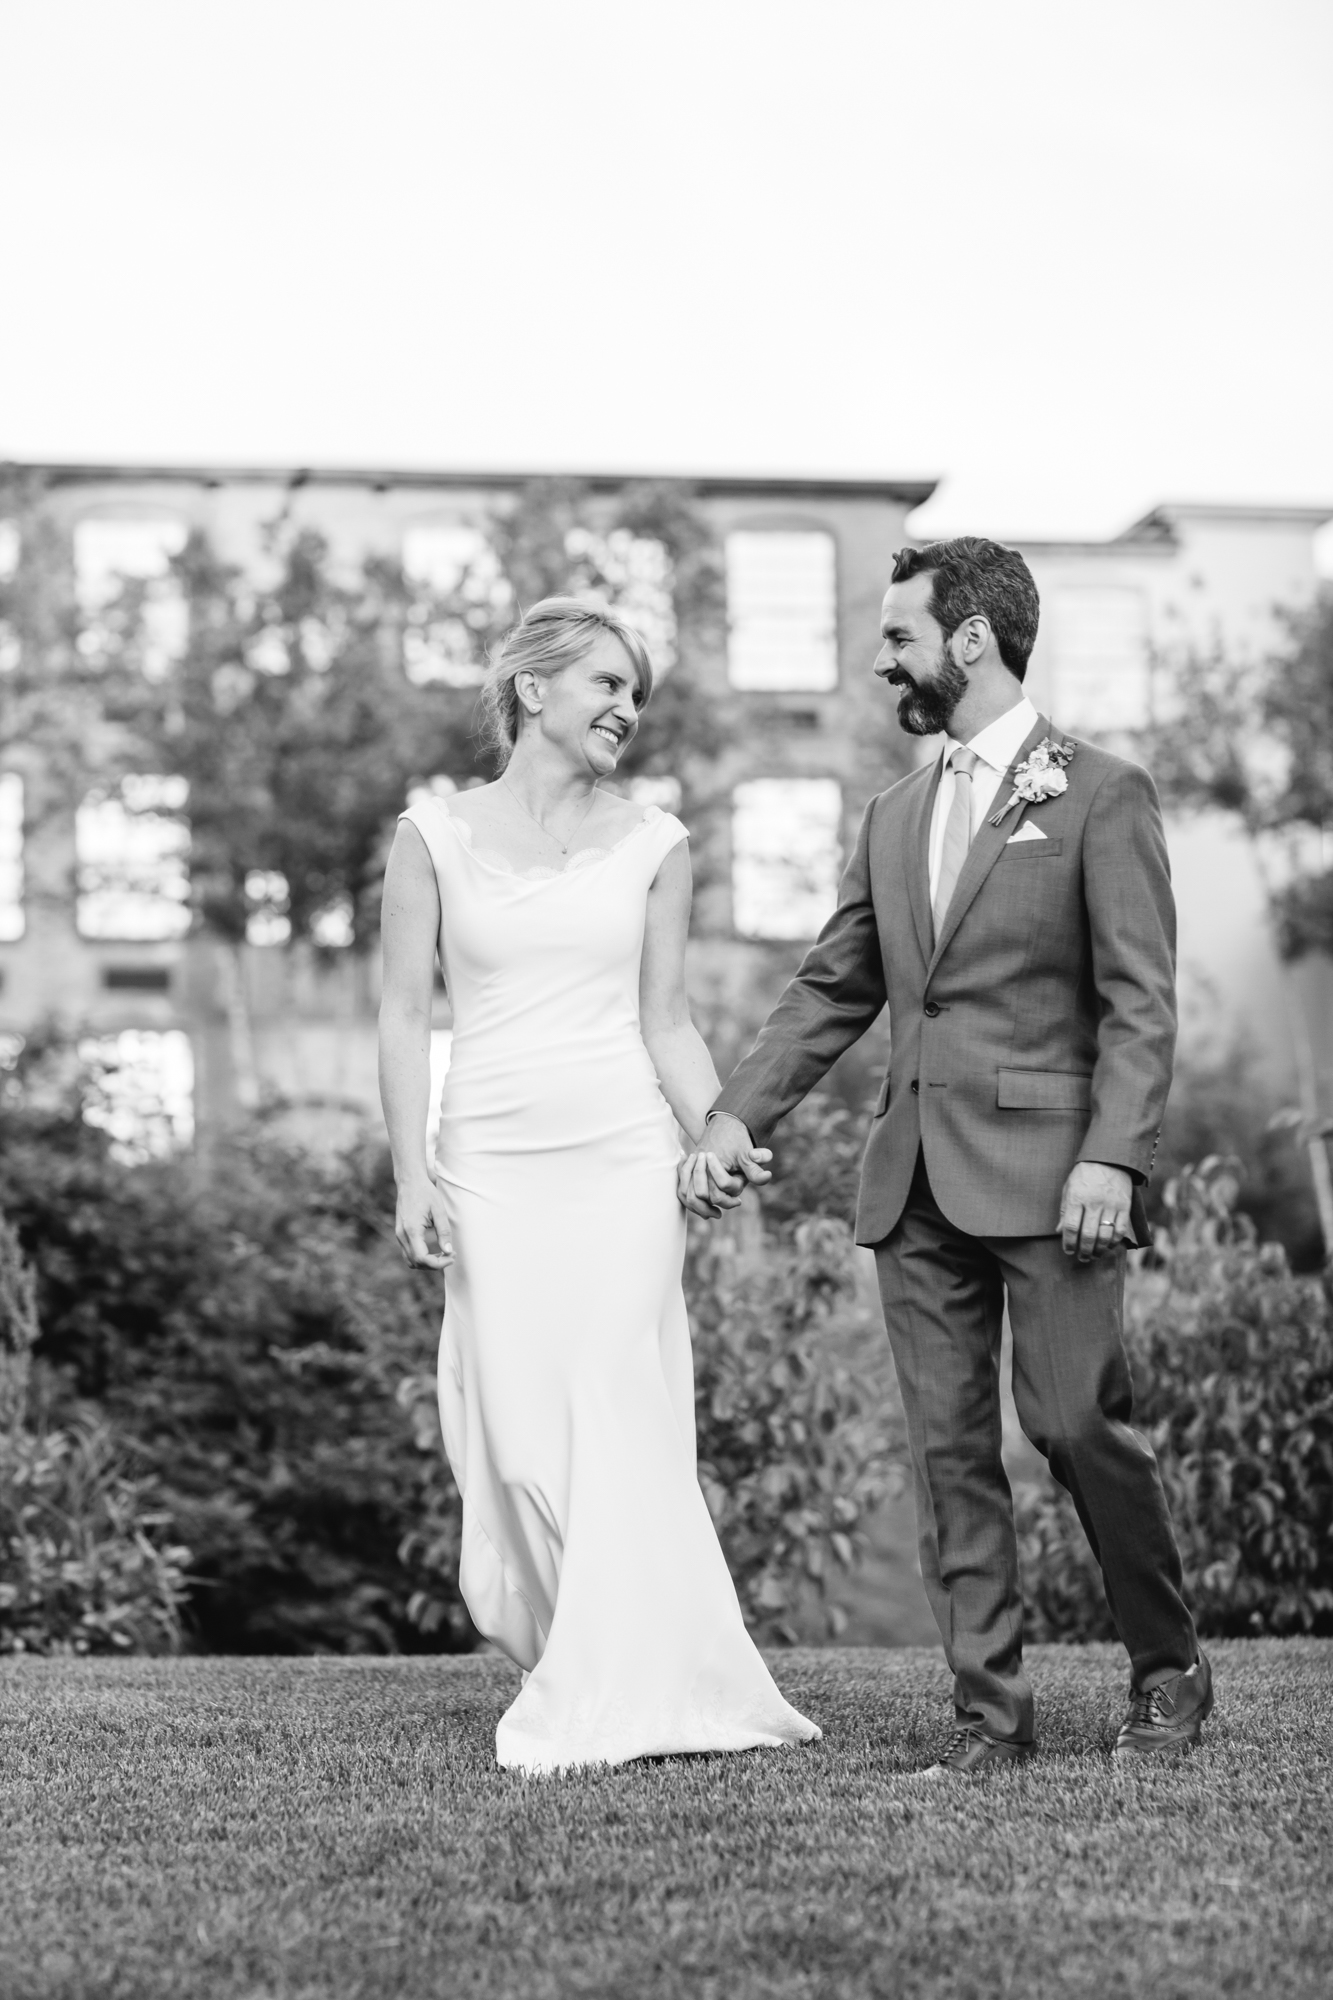 63_Rowan_Brian_The_Roundhouse_Wedding_Beacon_NY_Tanya_Salazar_Photography_302.jpg